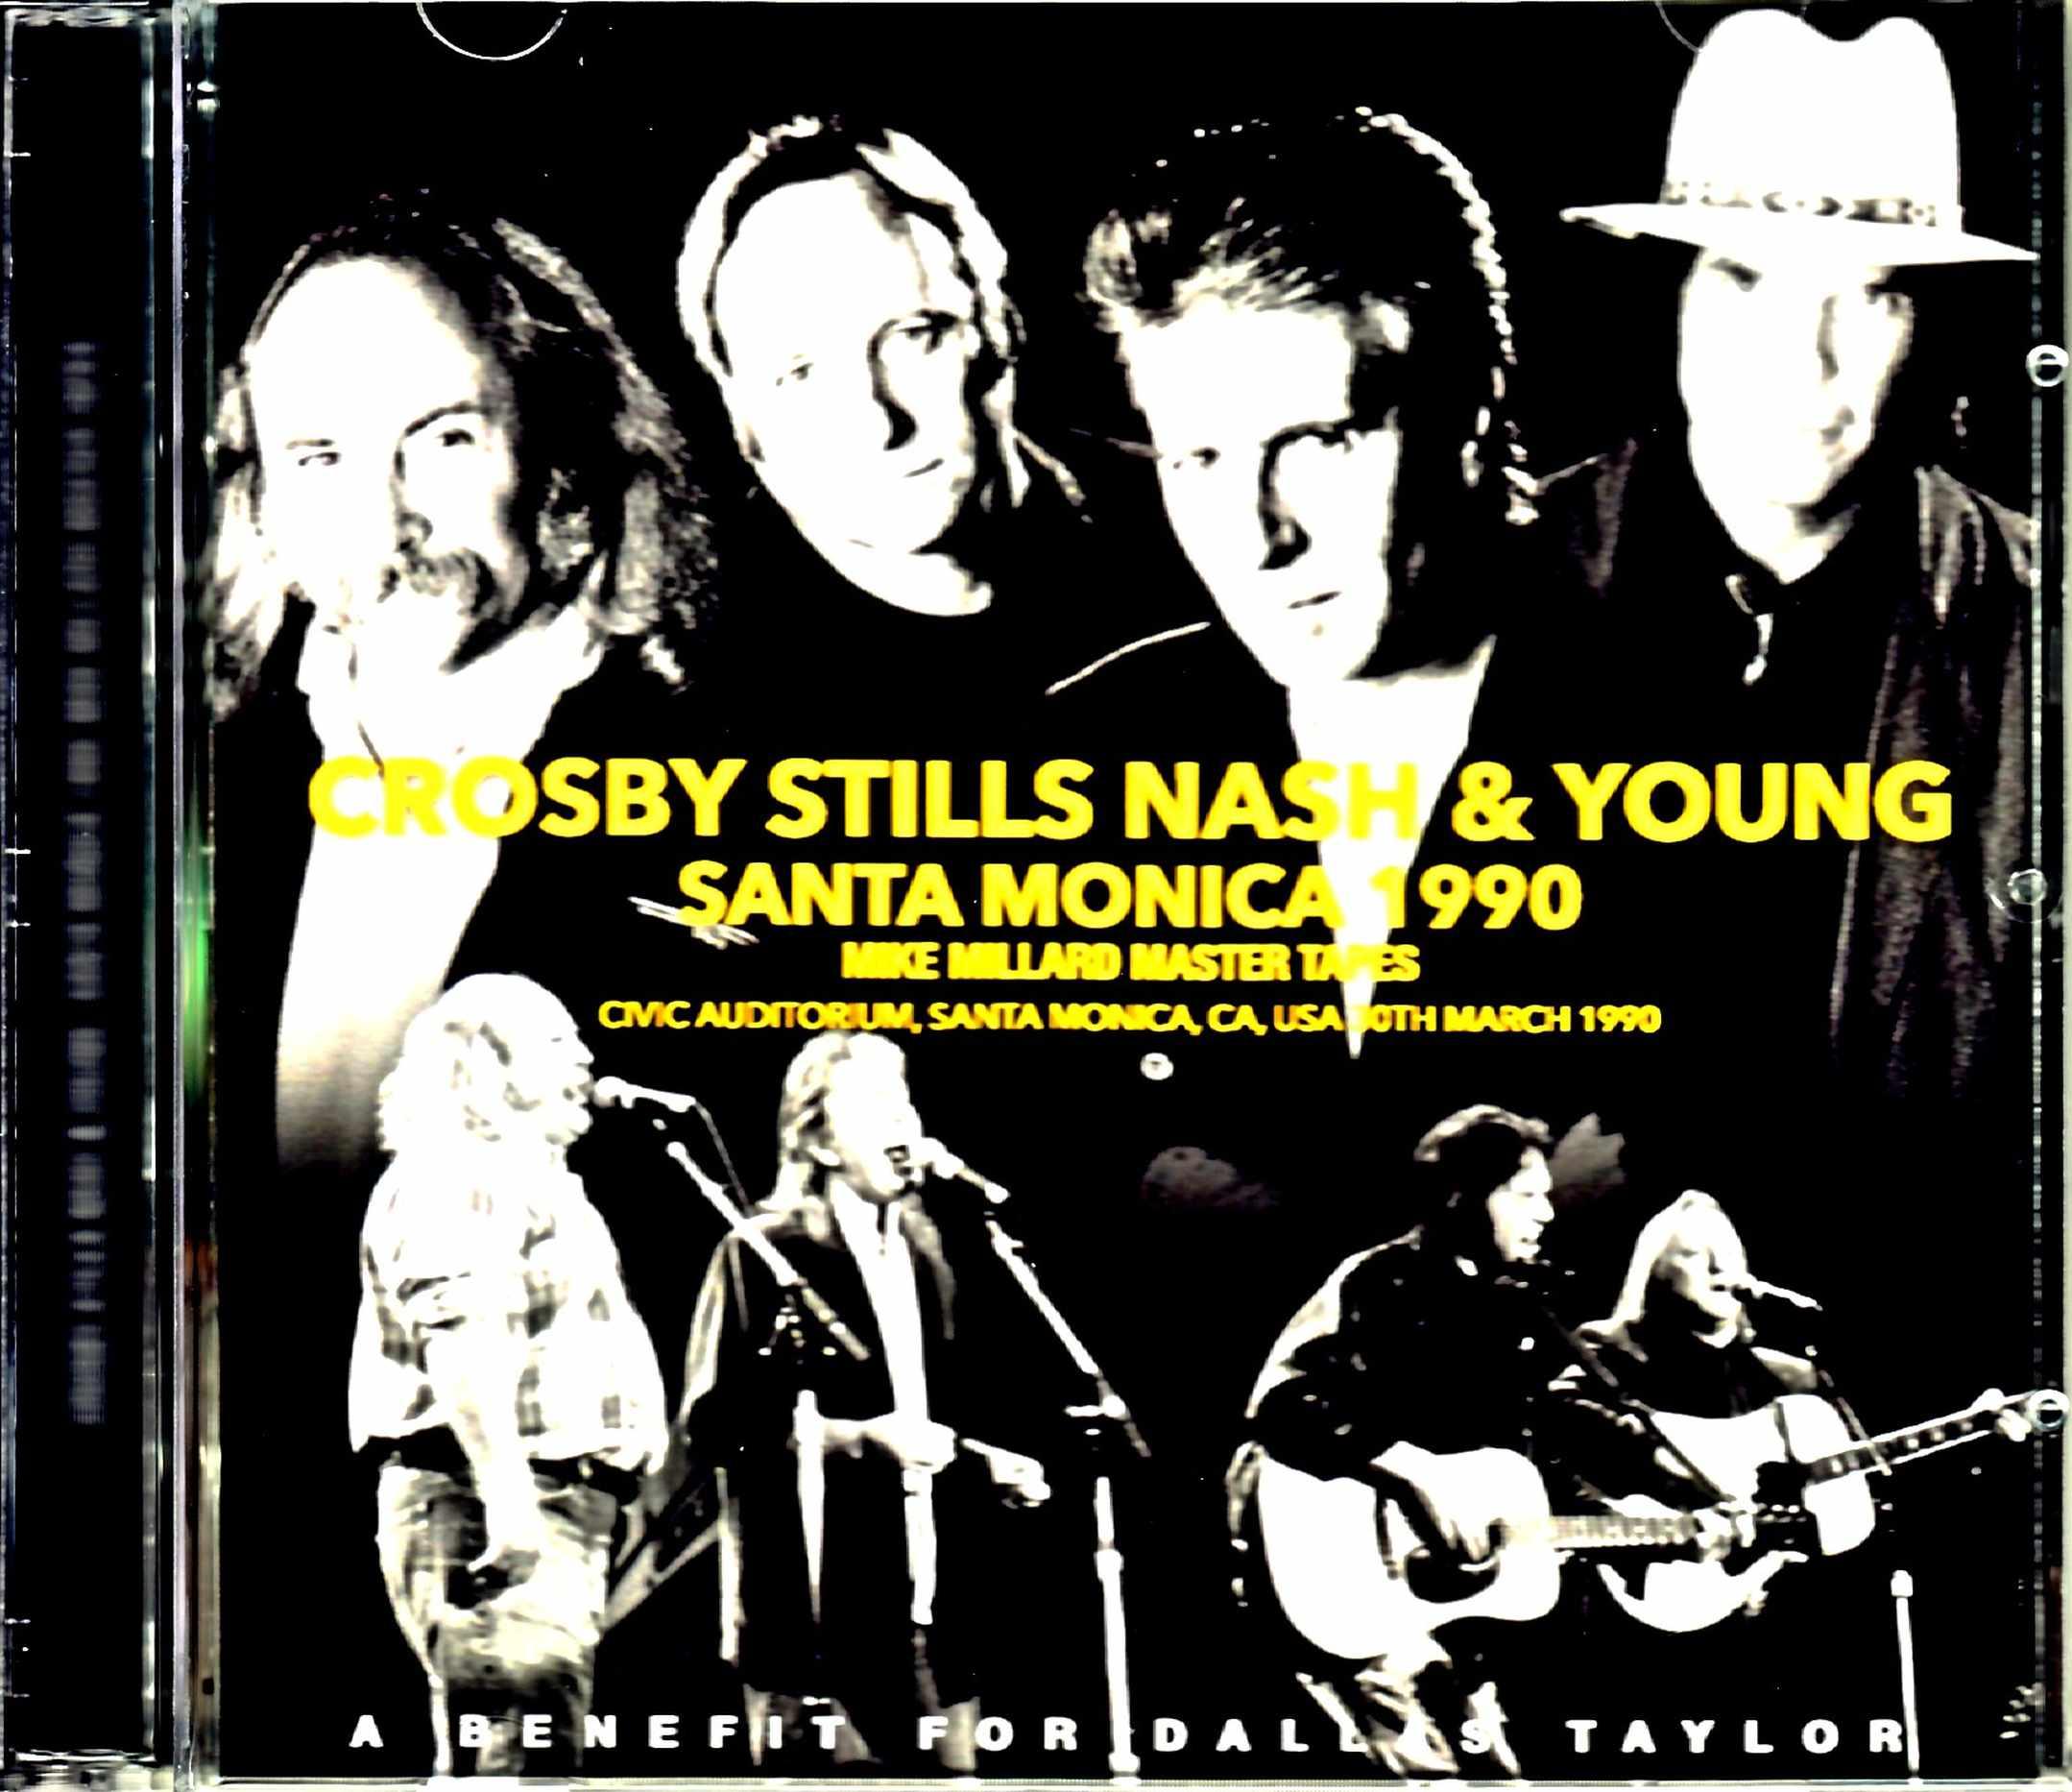 Crosby,Stills,Nash & Young クロスビー・スティルス・ナッシュ・アンド・ヤング/CA,USA 1990 Mike Millard Master Tapes